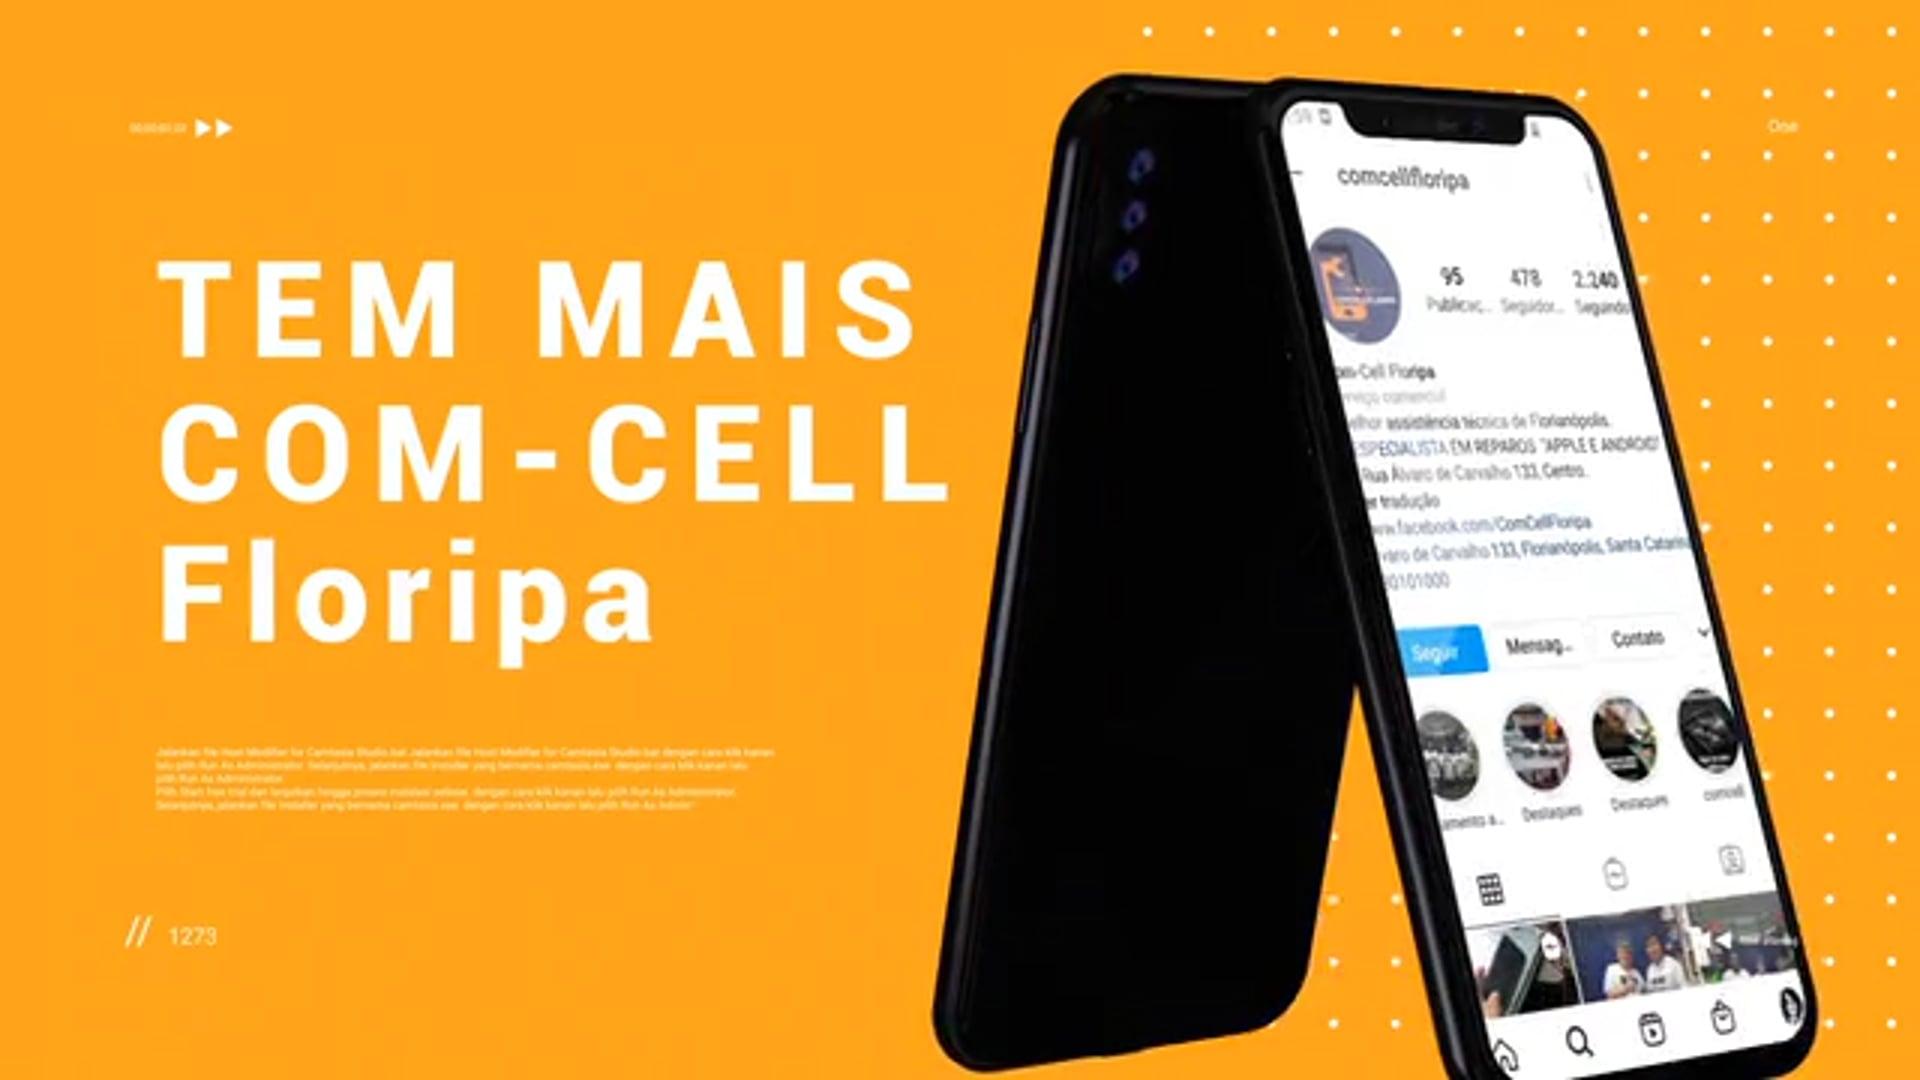 Vídeo Anúncio para COM-CELL Floripa.              | Agência Síntese |